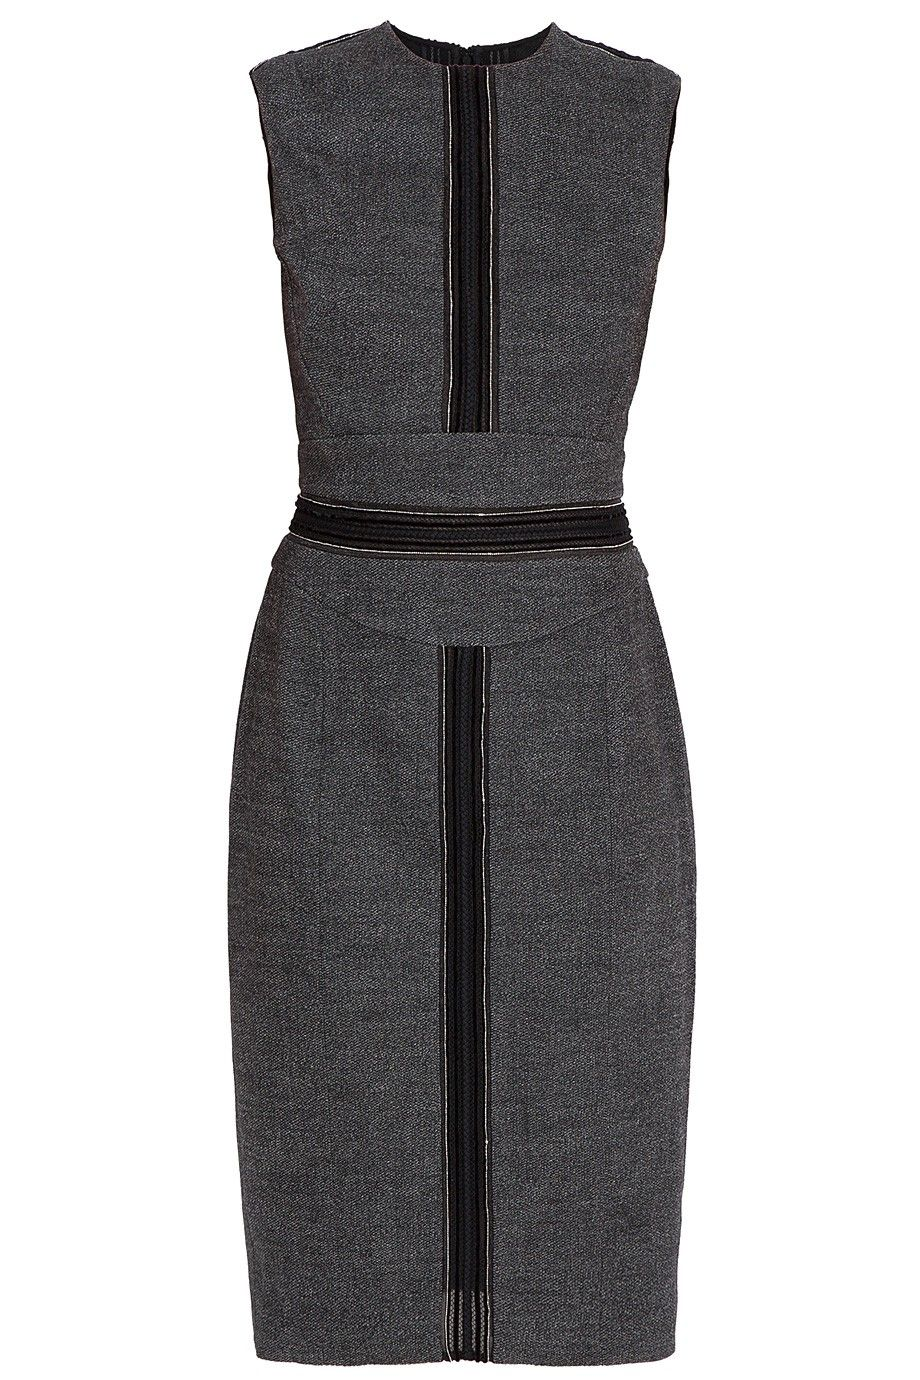 Sl wool short dress by elie saab utique